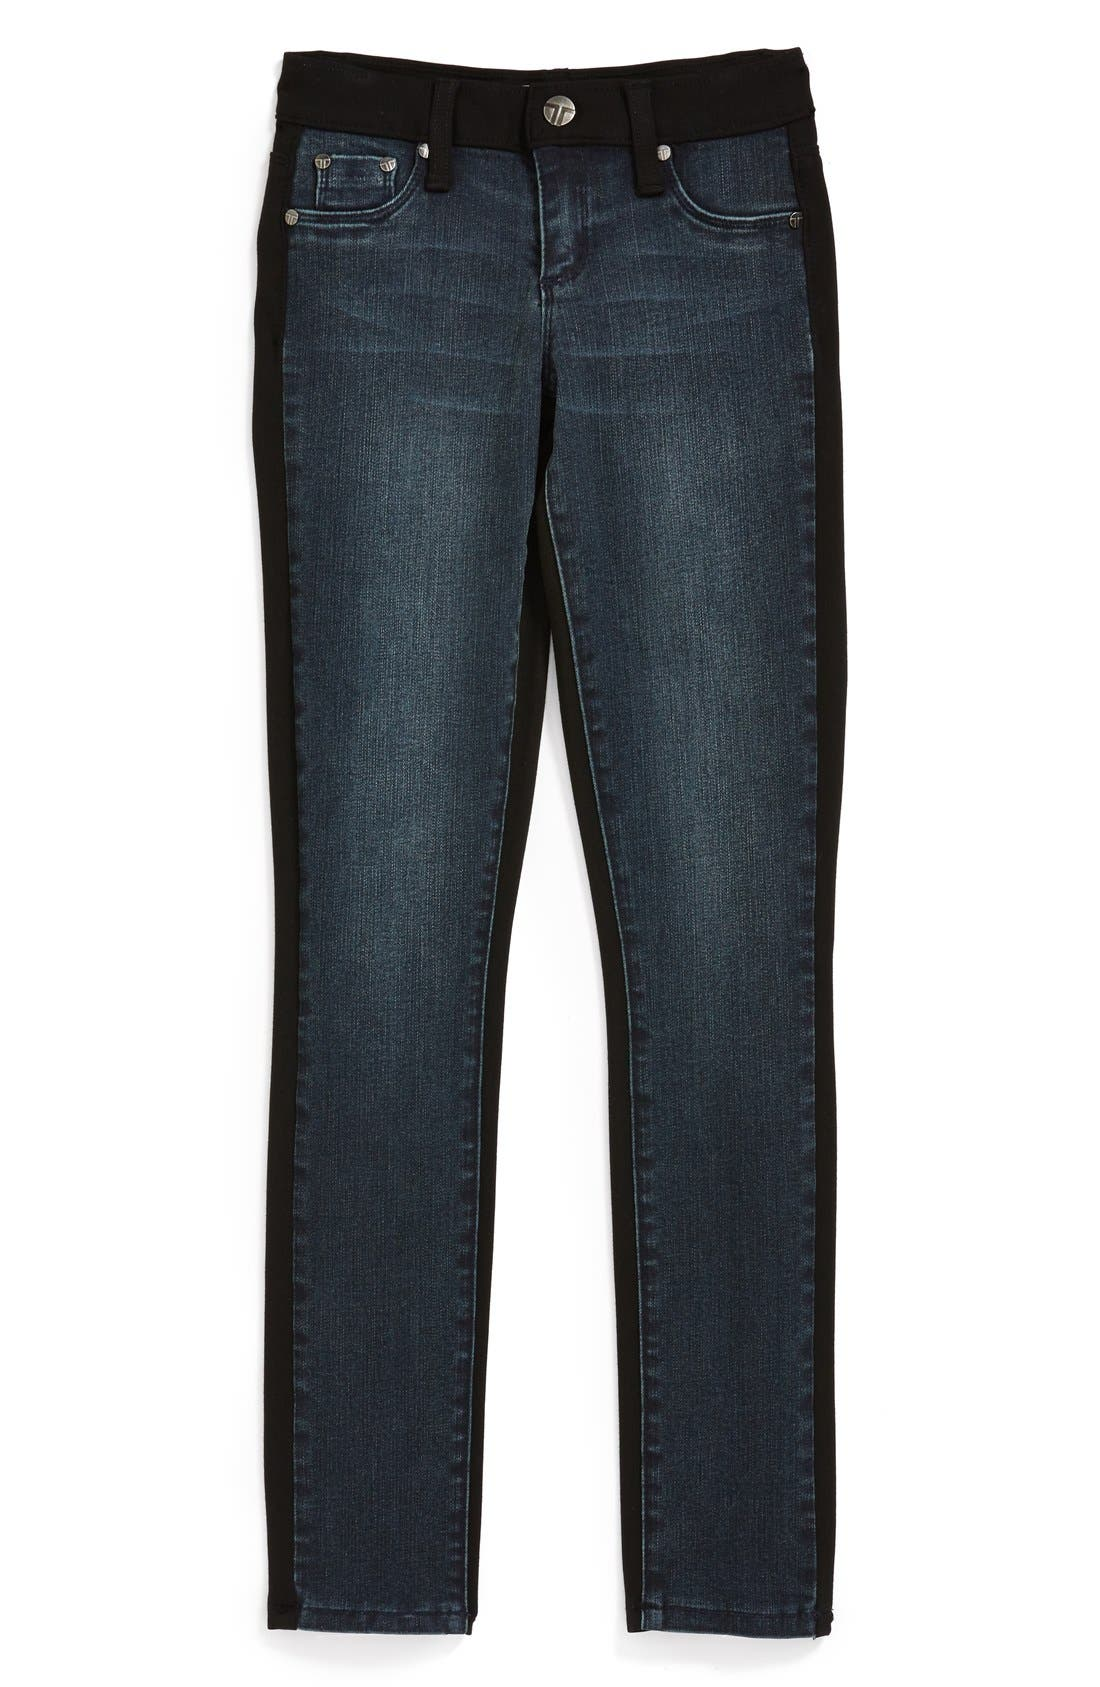 Alternate Image 1 Selected - Tractr Denim Front Knit Back Pants (Big Girls)